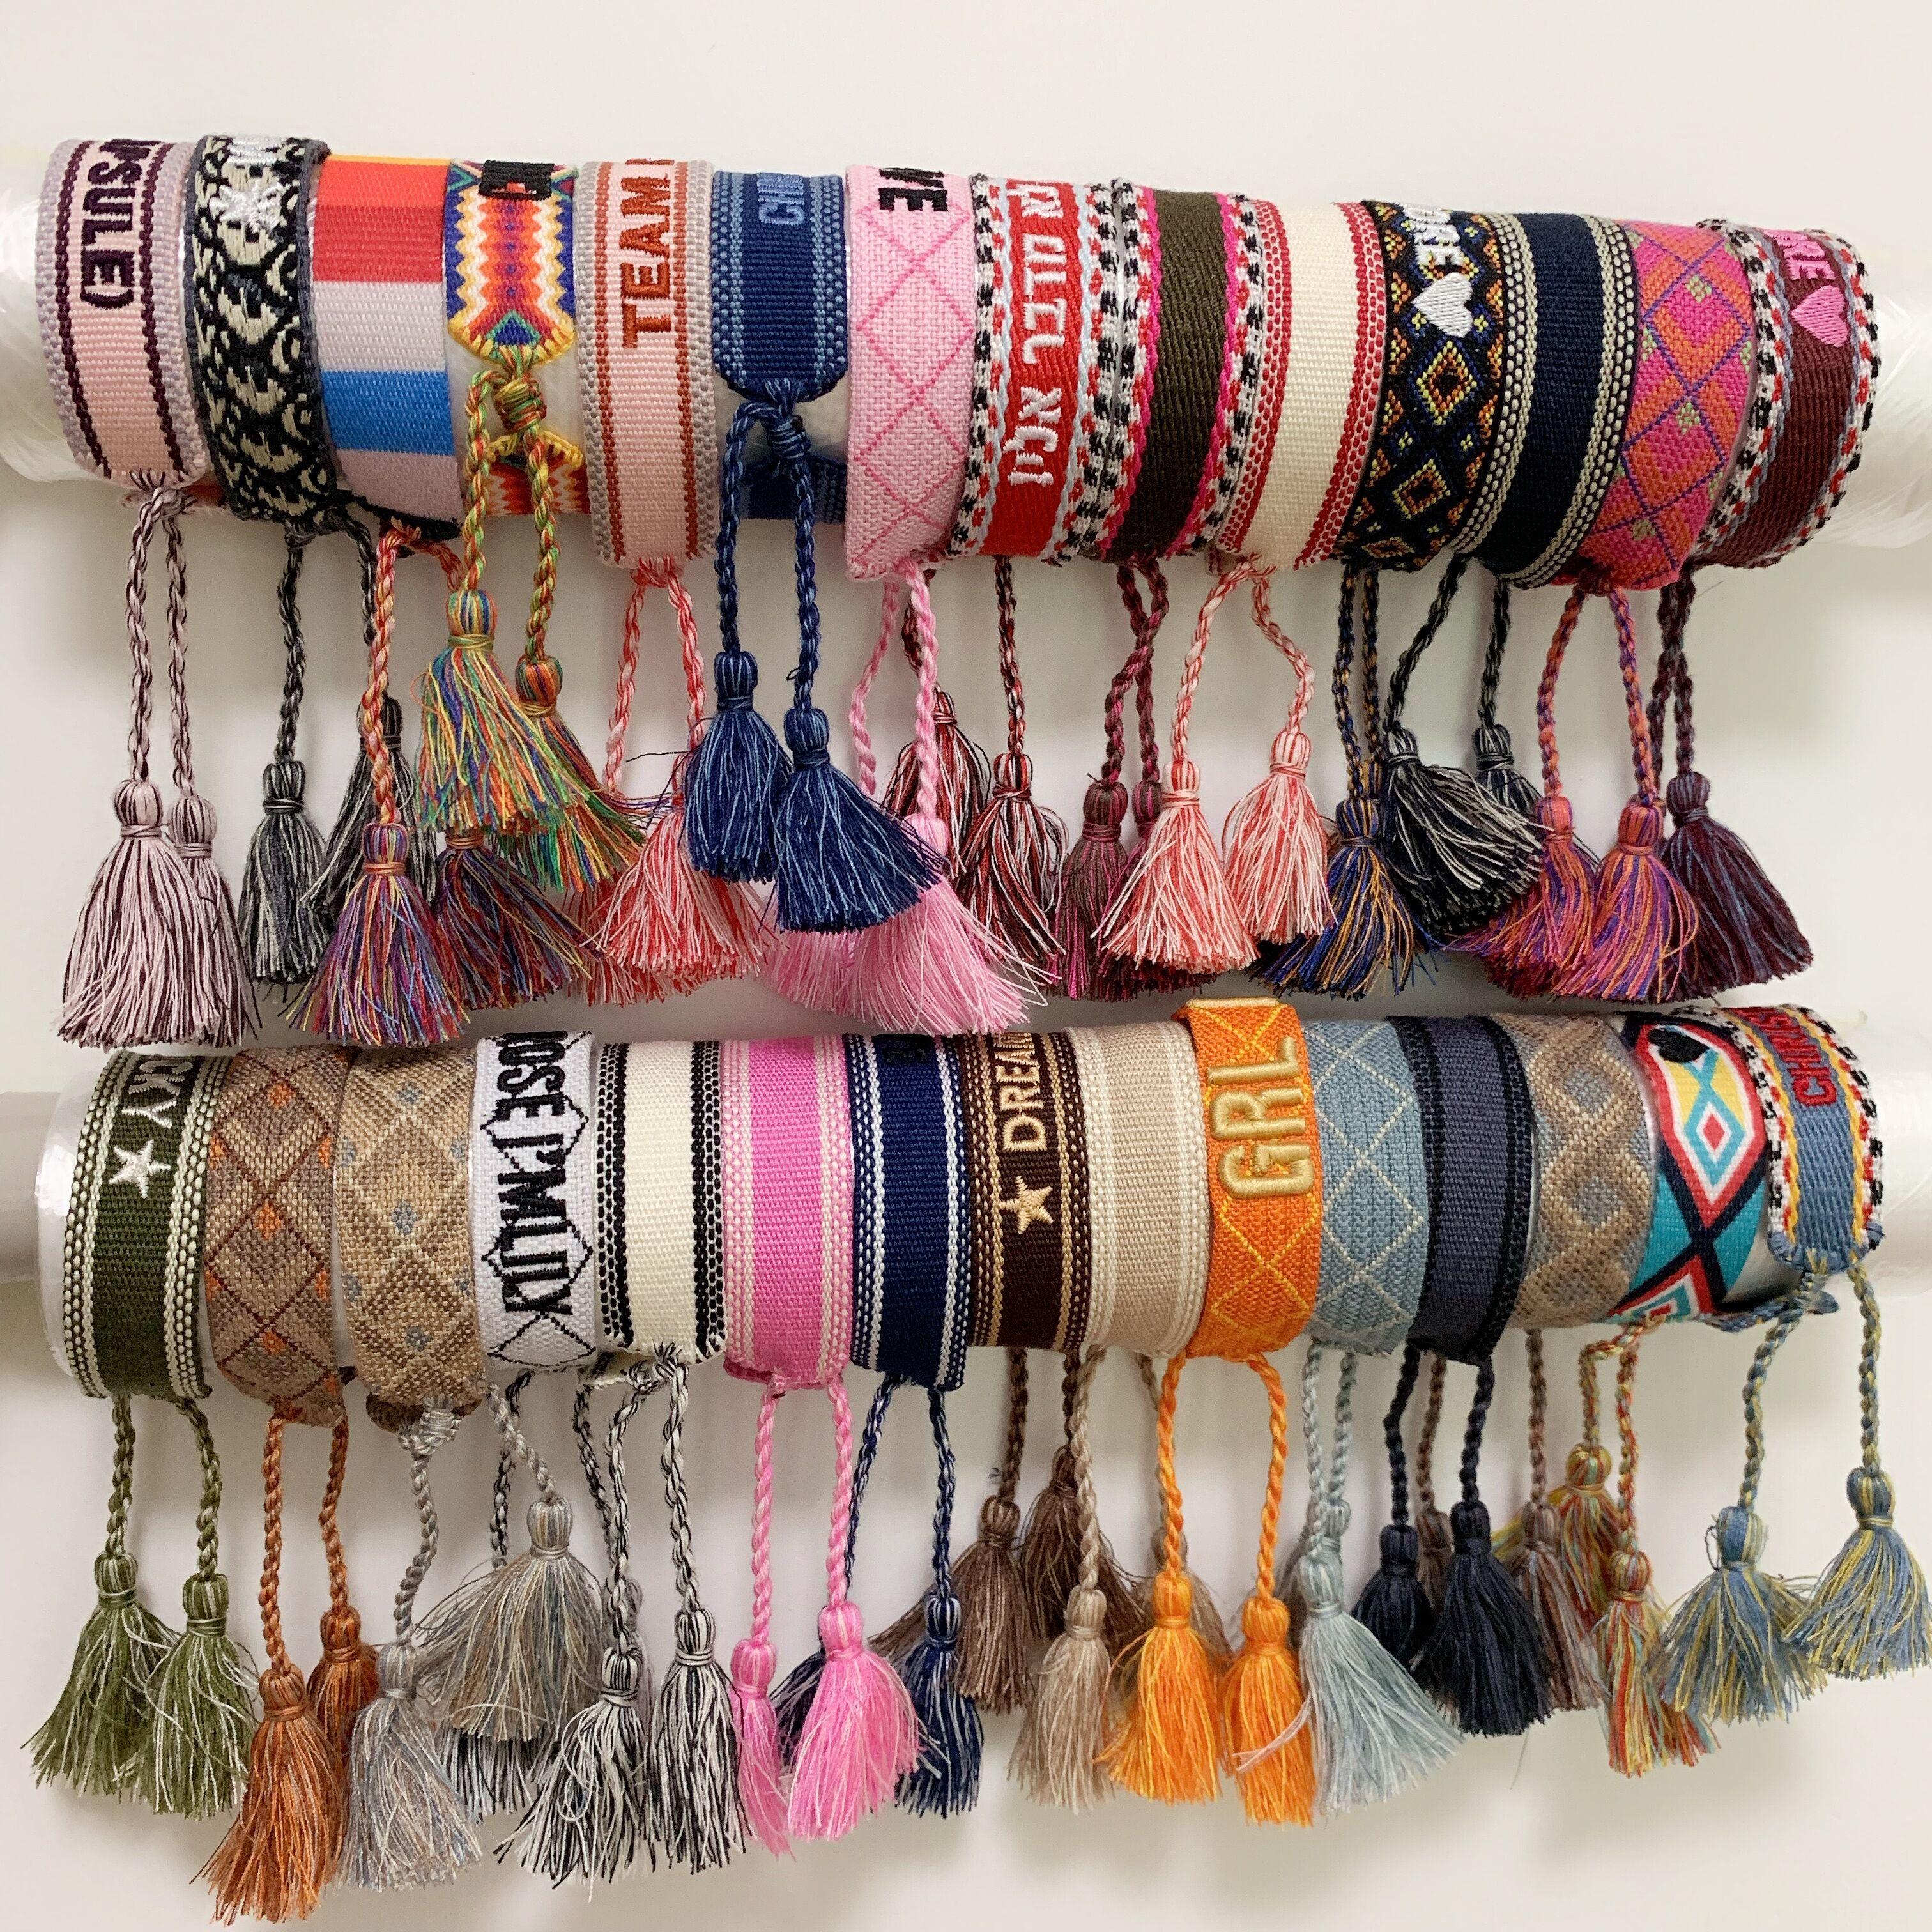 Designer Marca Jóias Mulheres Homens Pulseiras Moda Luxo trançada pulseira borla 34 Estilo Top Quality amantes bordados Pulseira presente